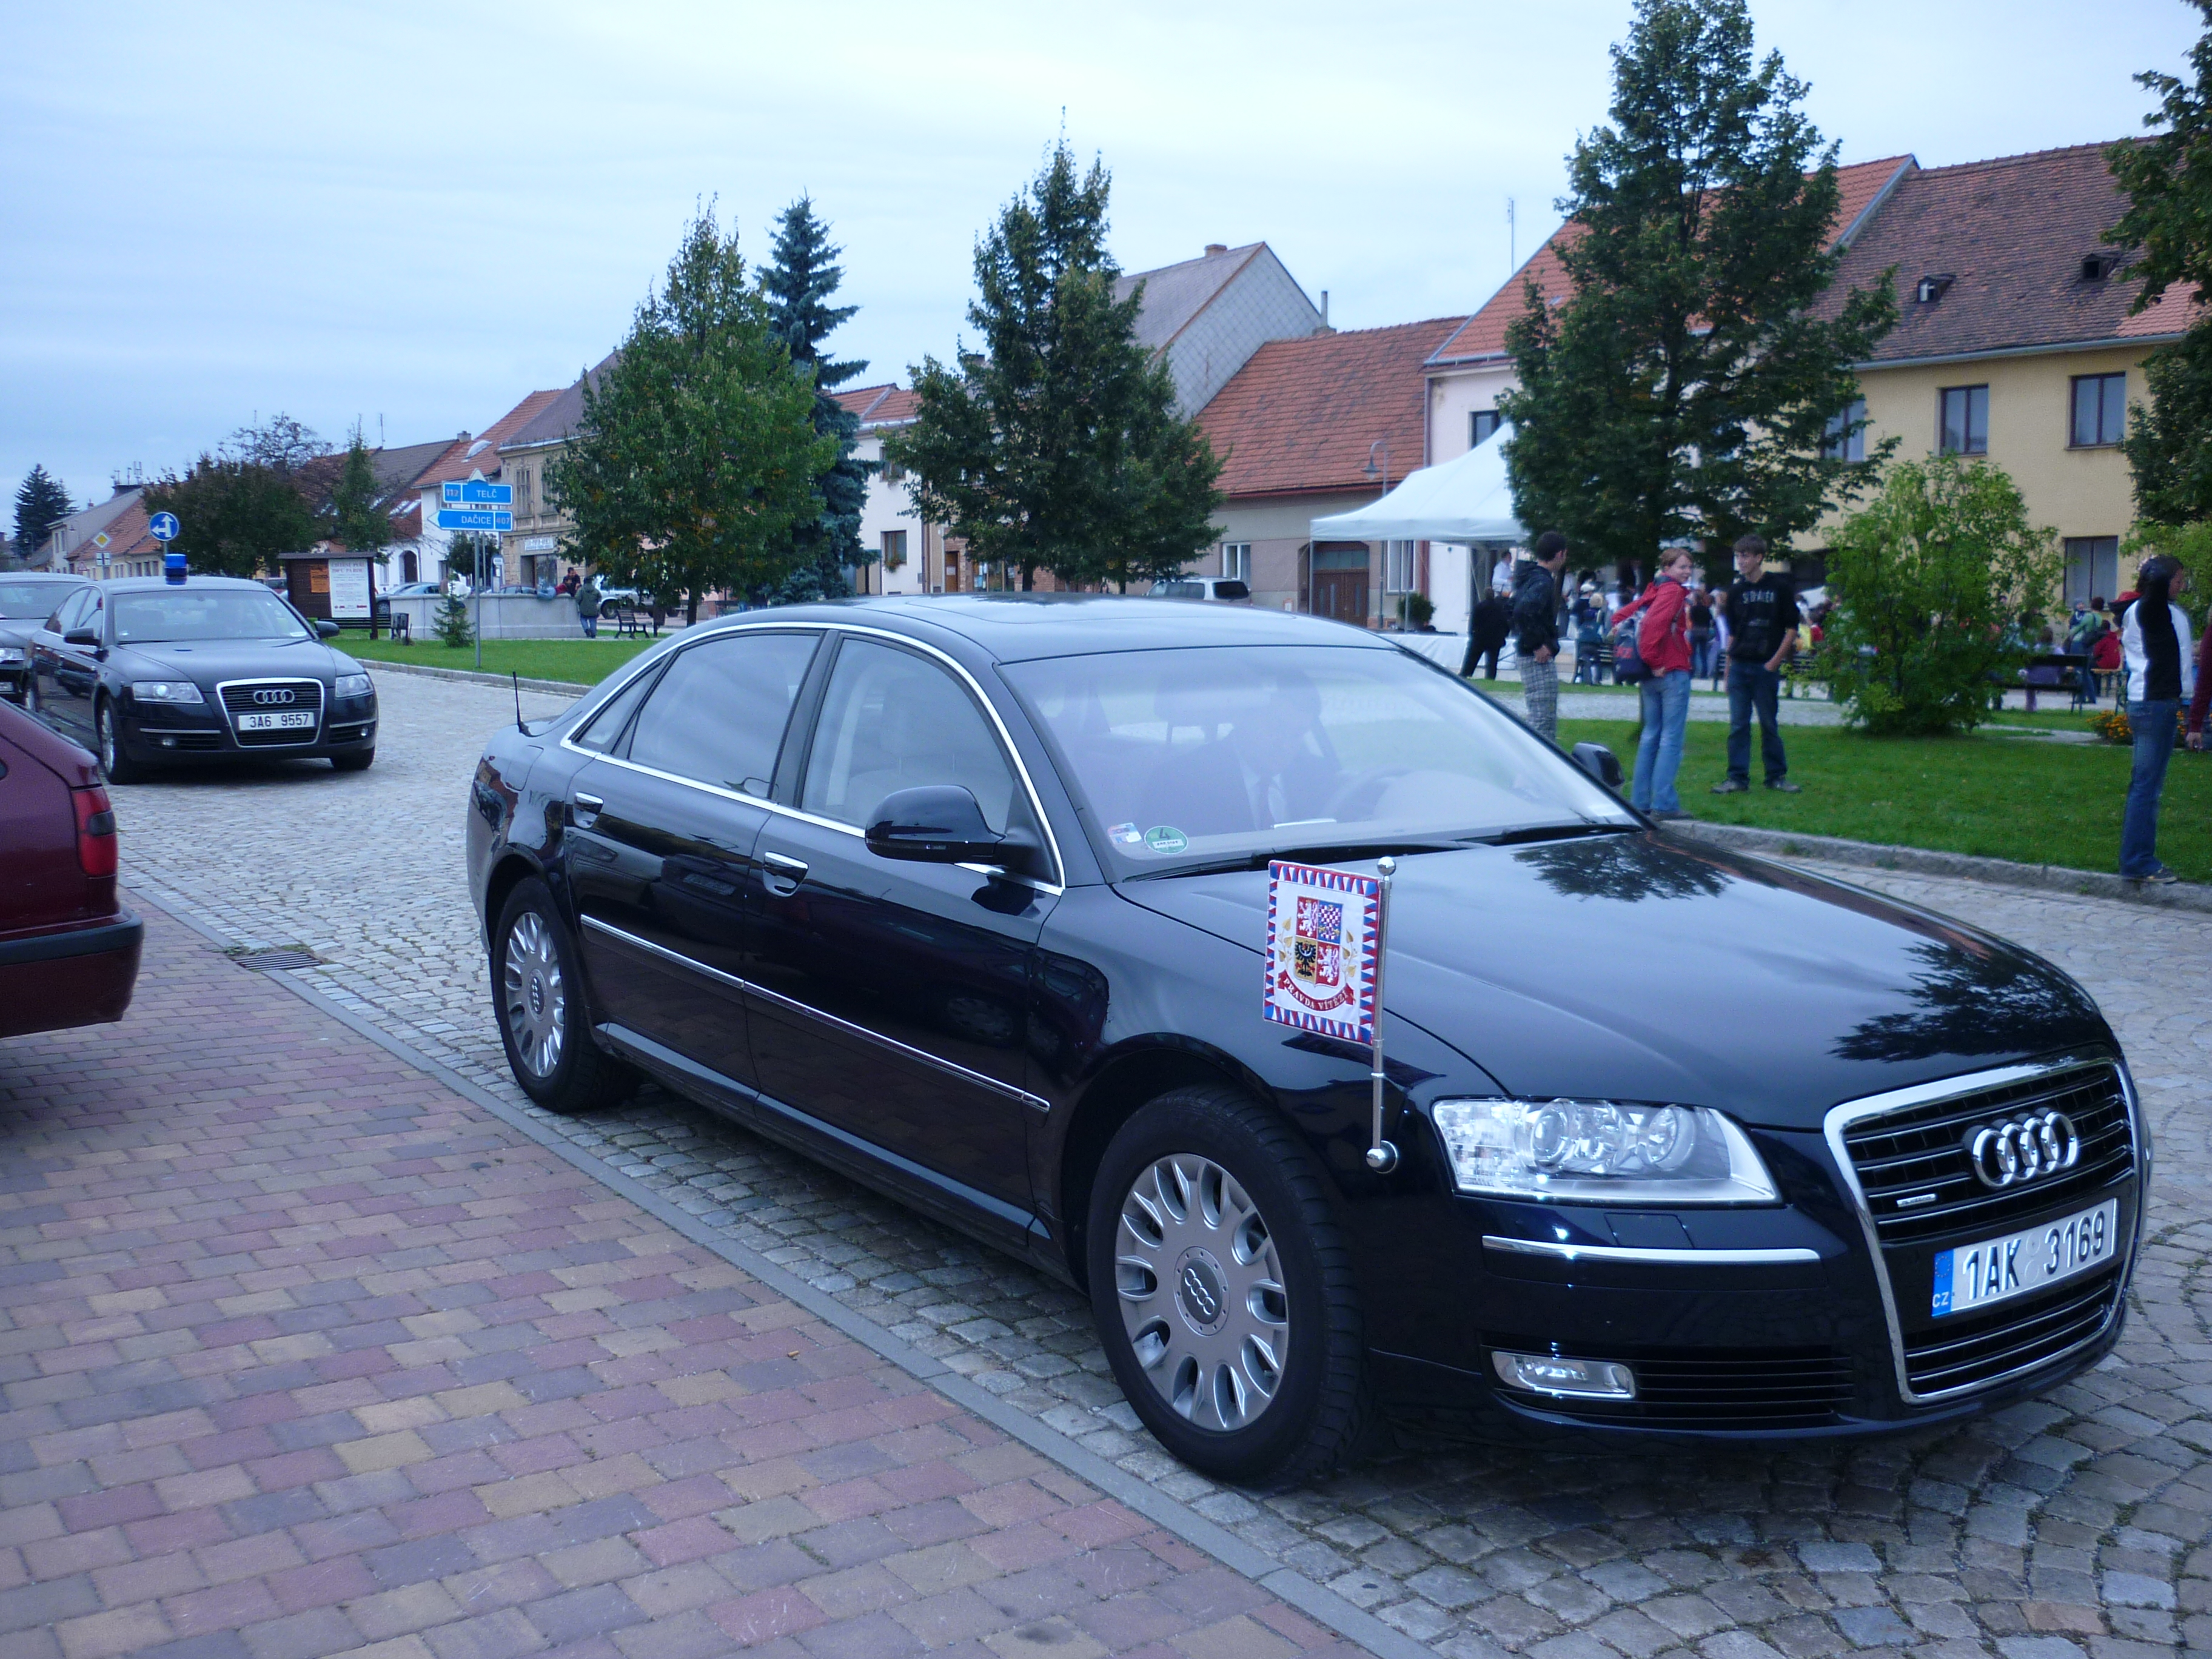 Audi A8 W12 >> File:AUDI A8 4.2 Quattro - Czech President.jpeg ...